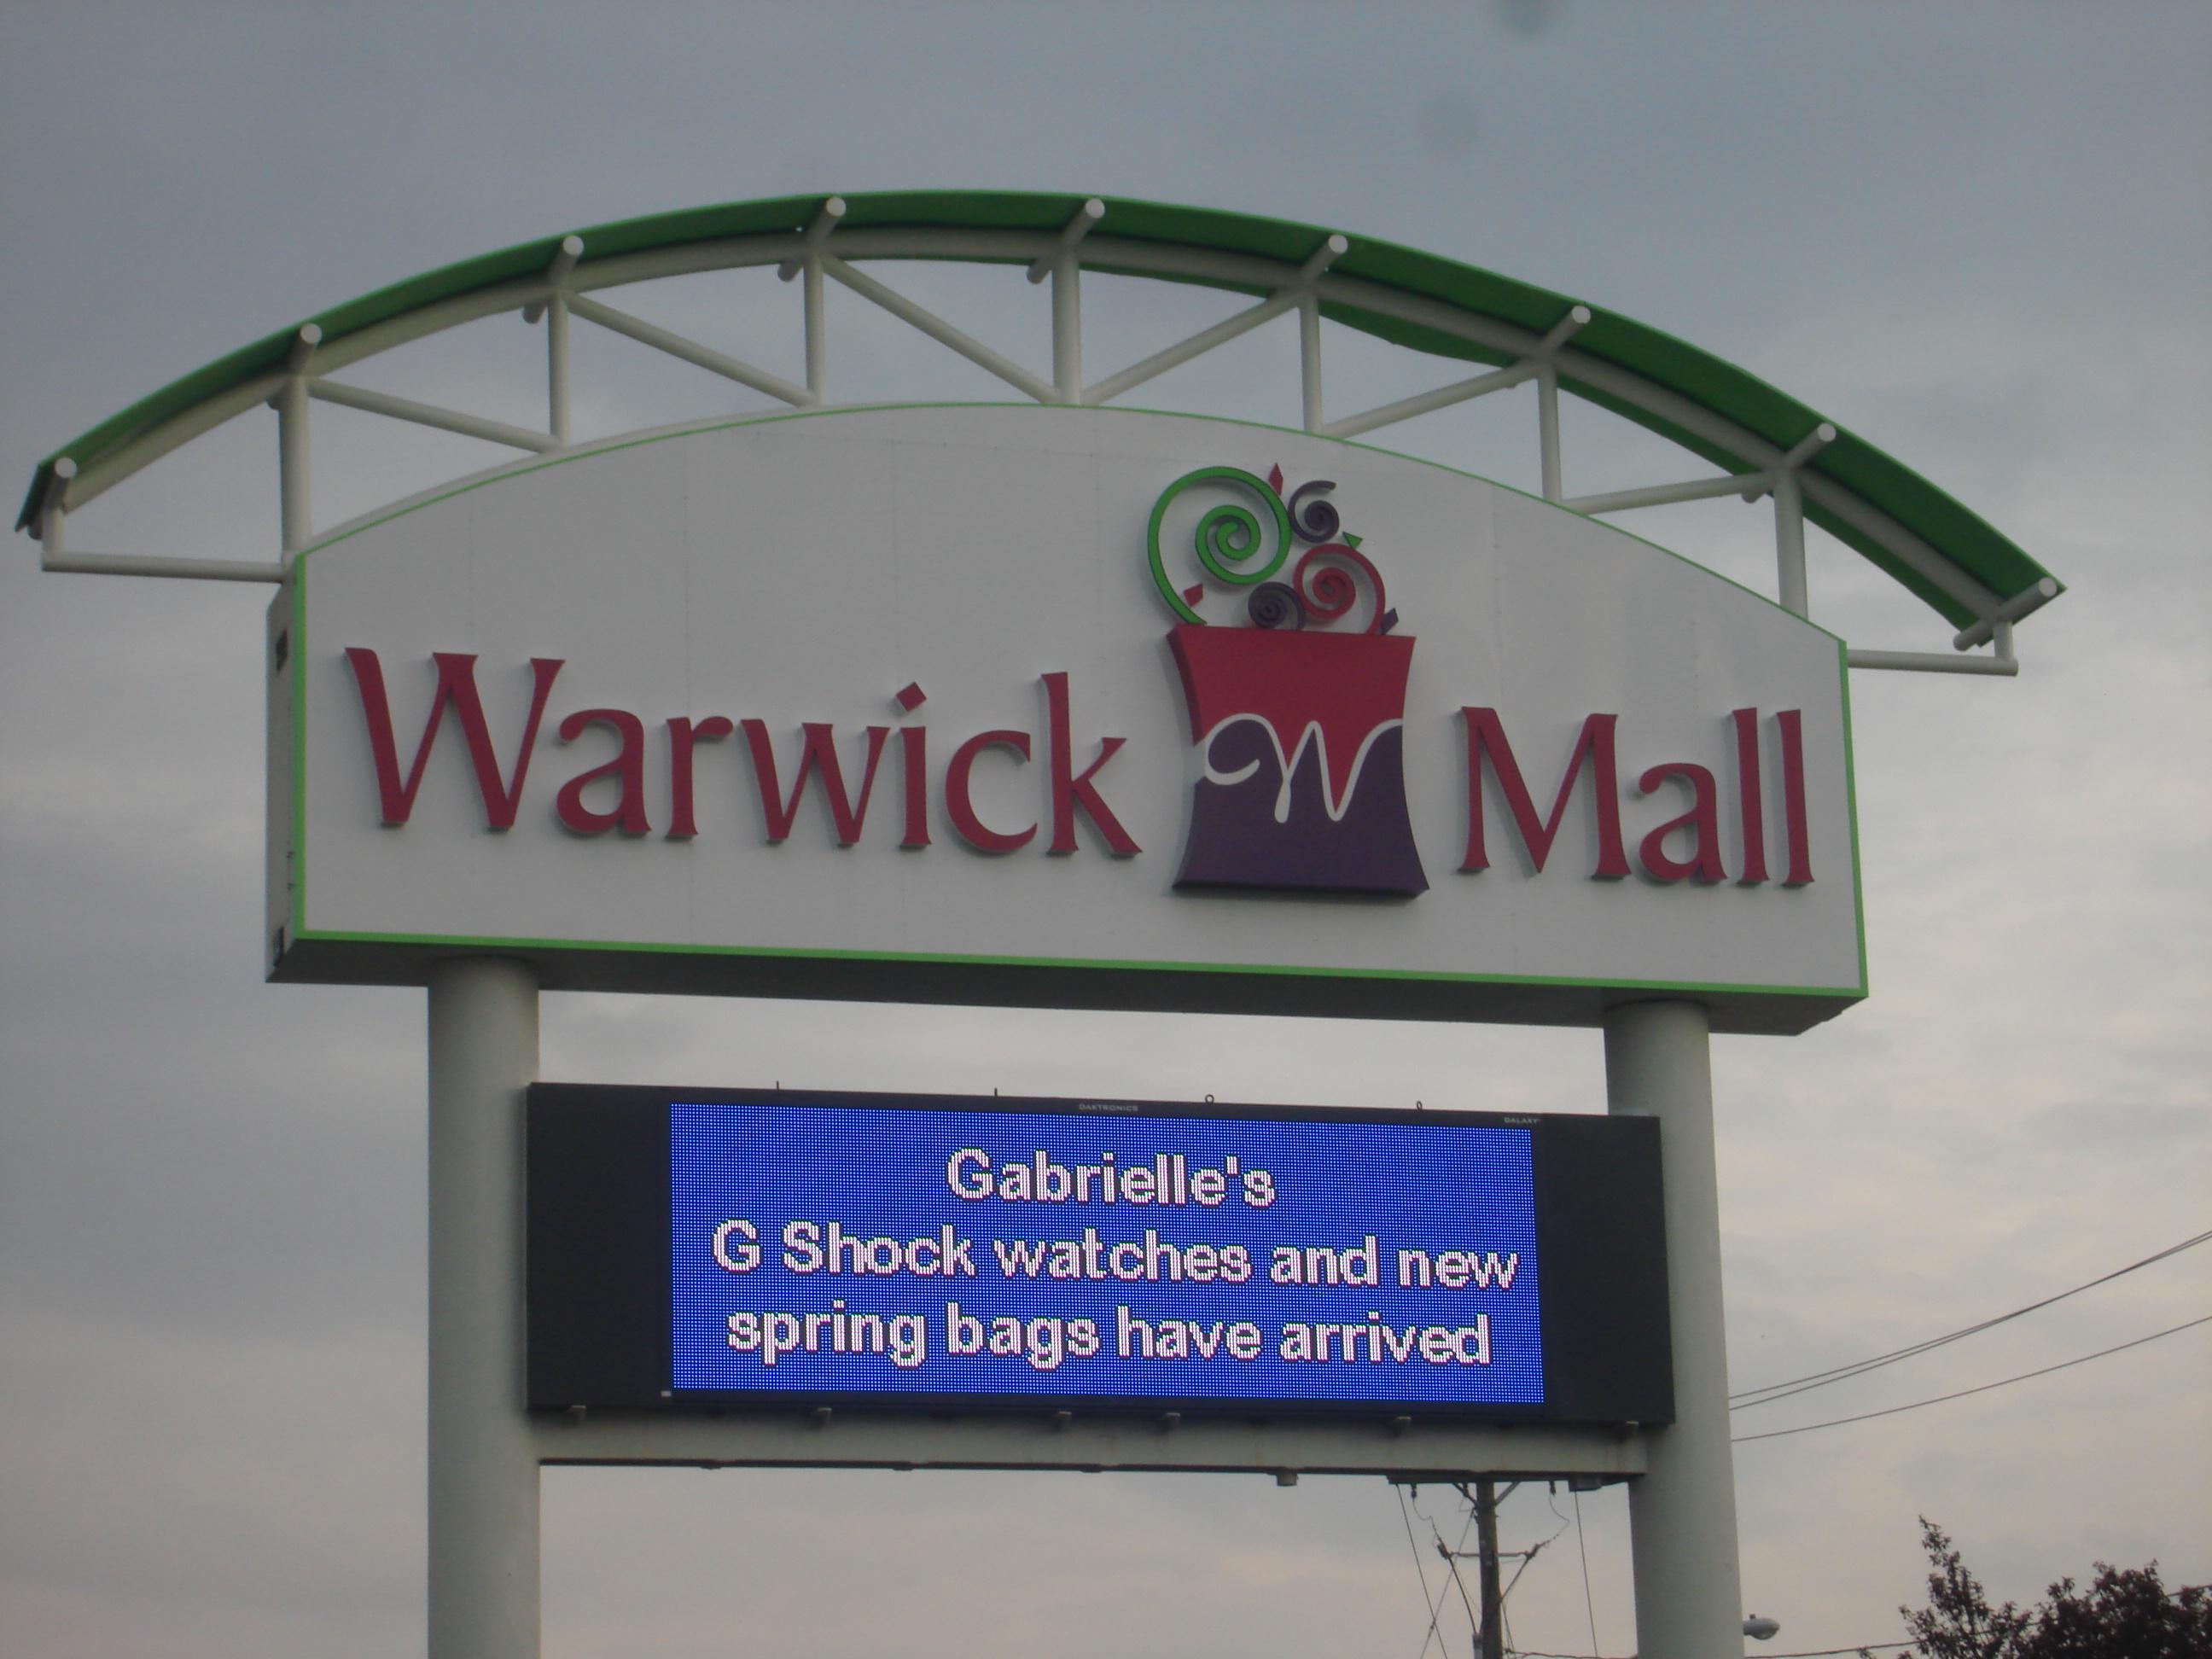 warwick mall